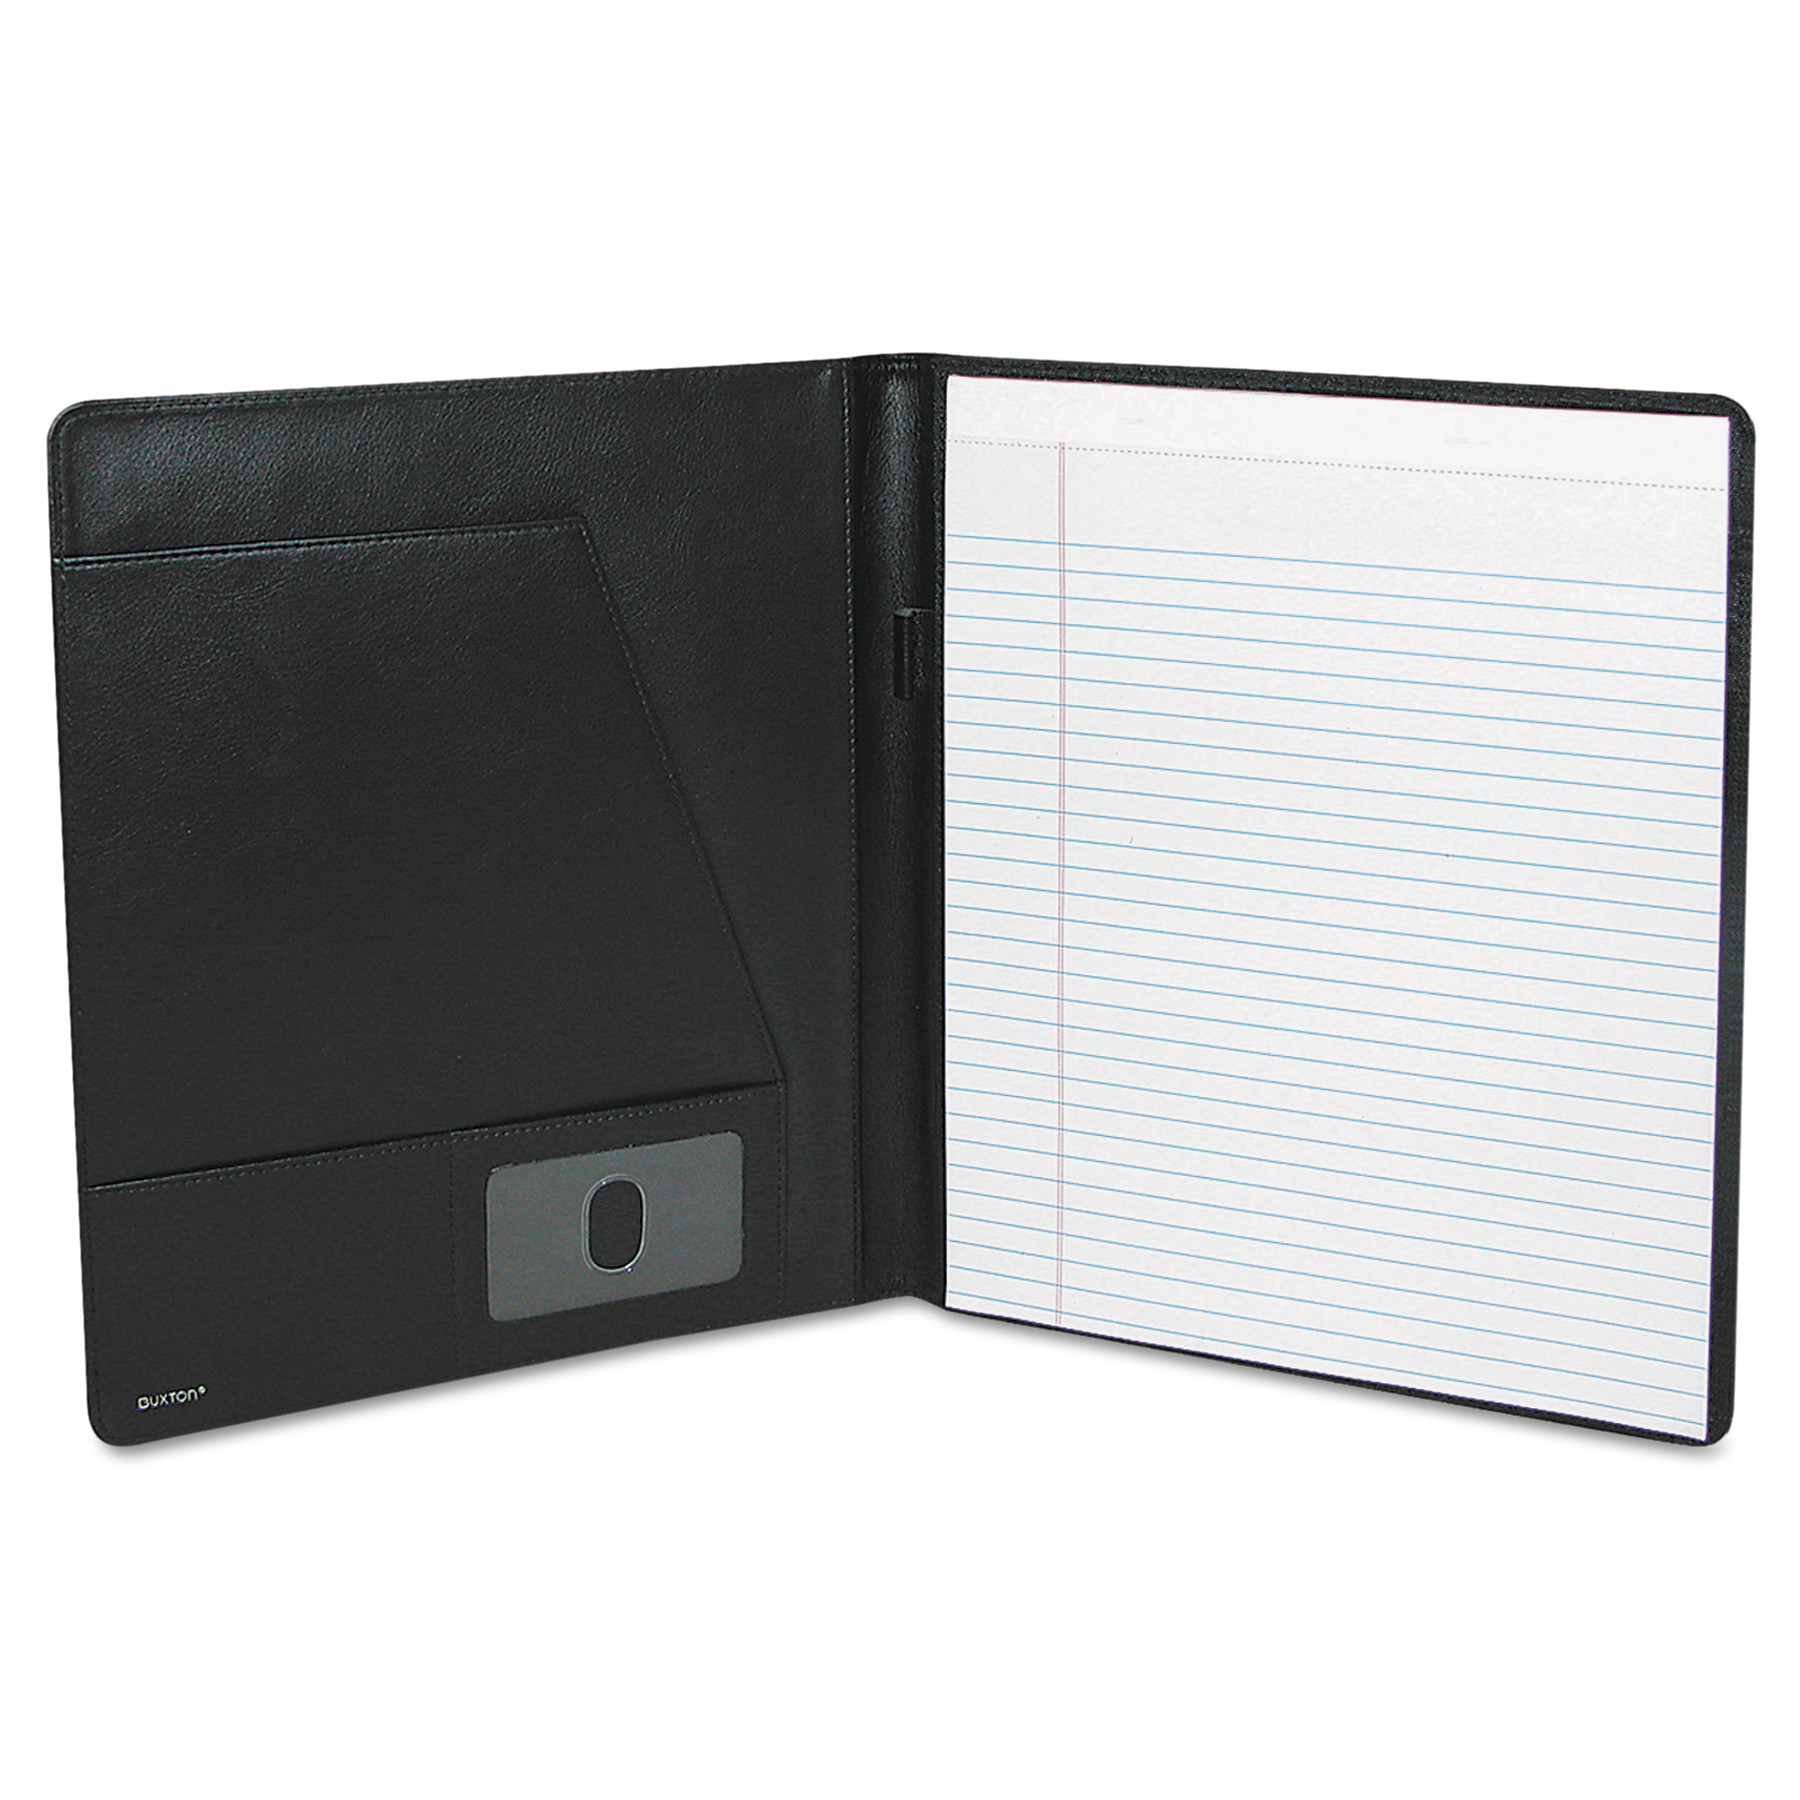 Buxton Executive Leather Padfolio, 9-1/2 x 12-1/2, Black - Walmart.com